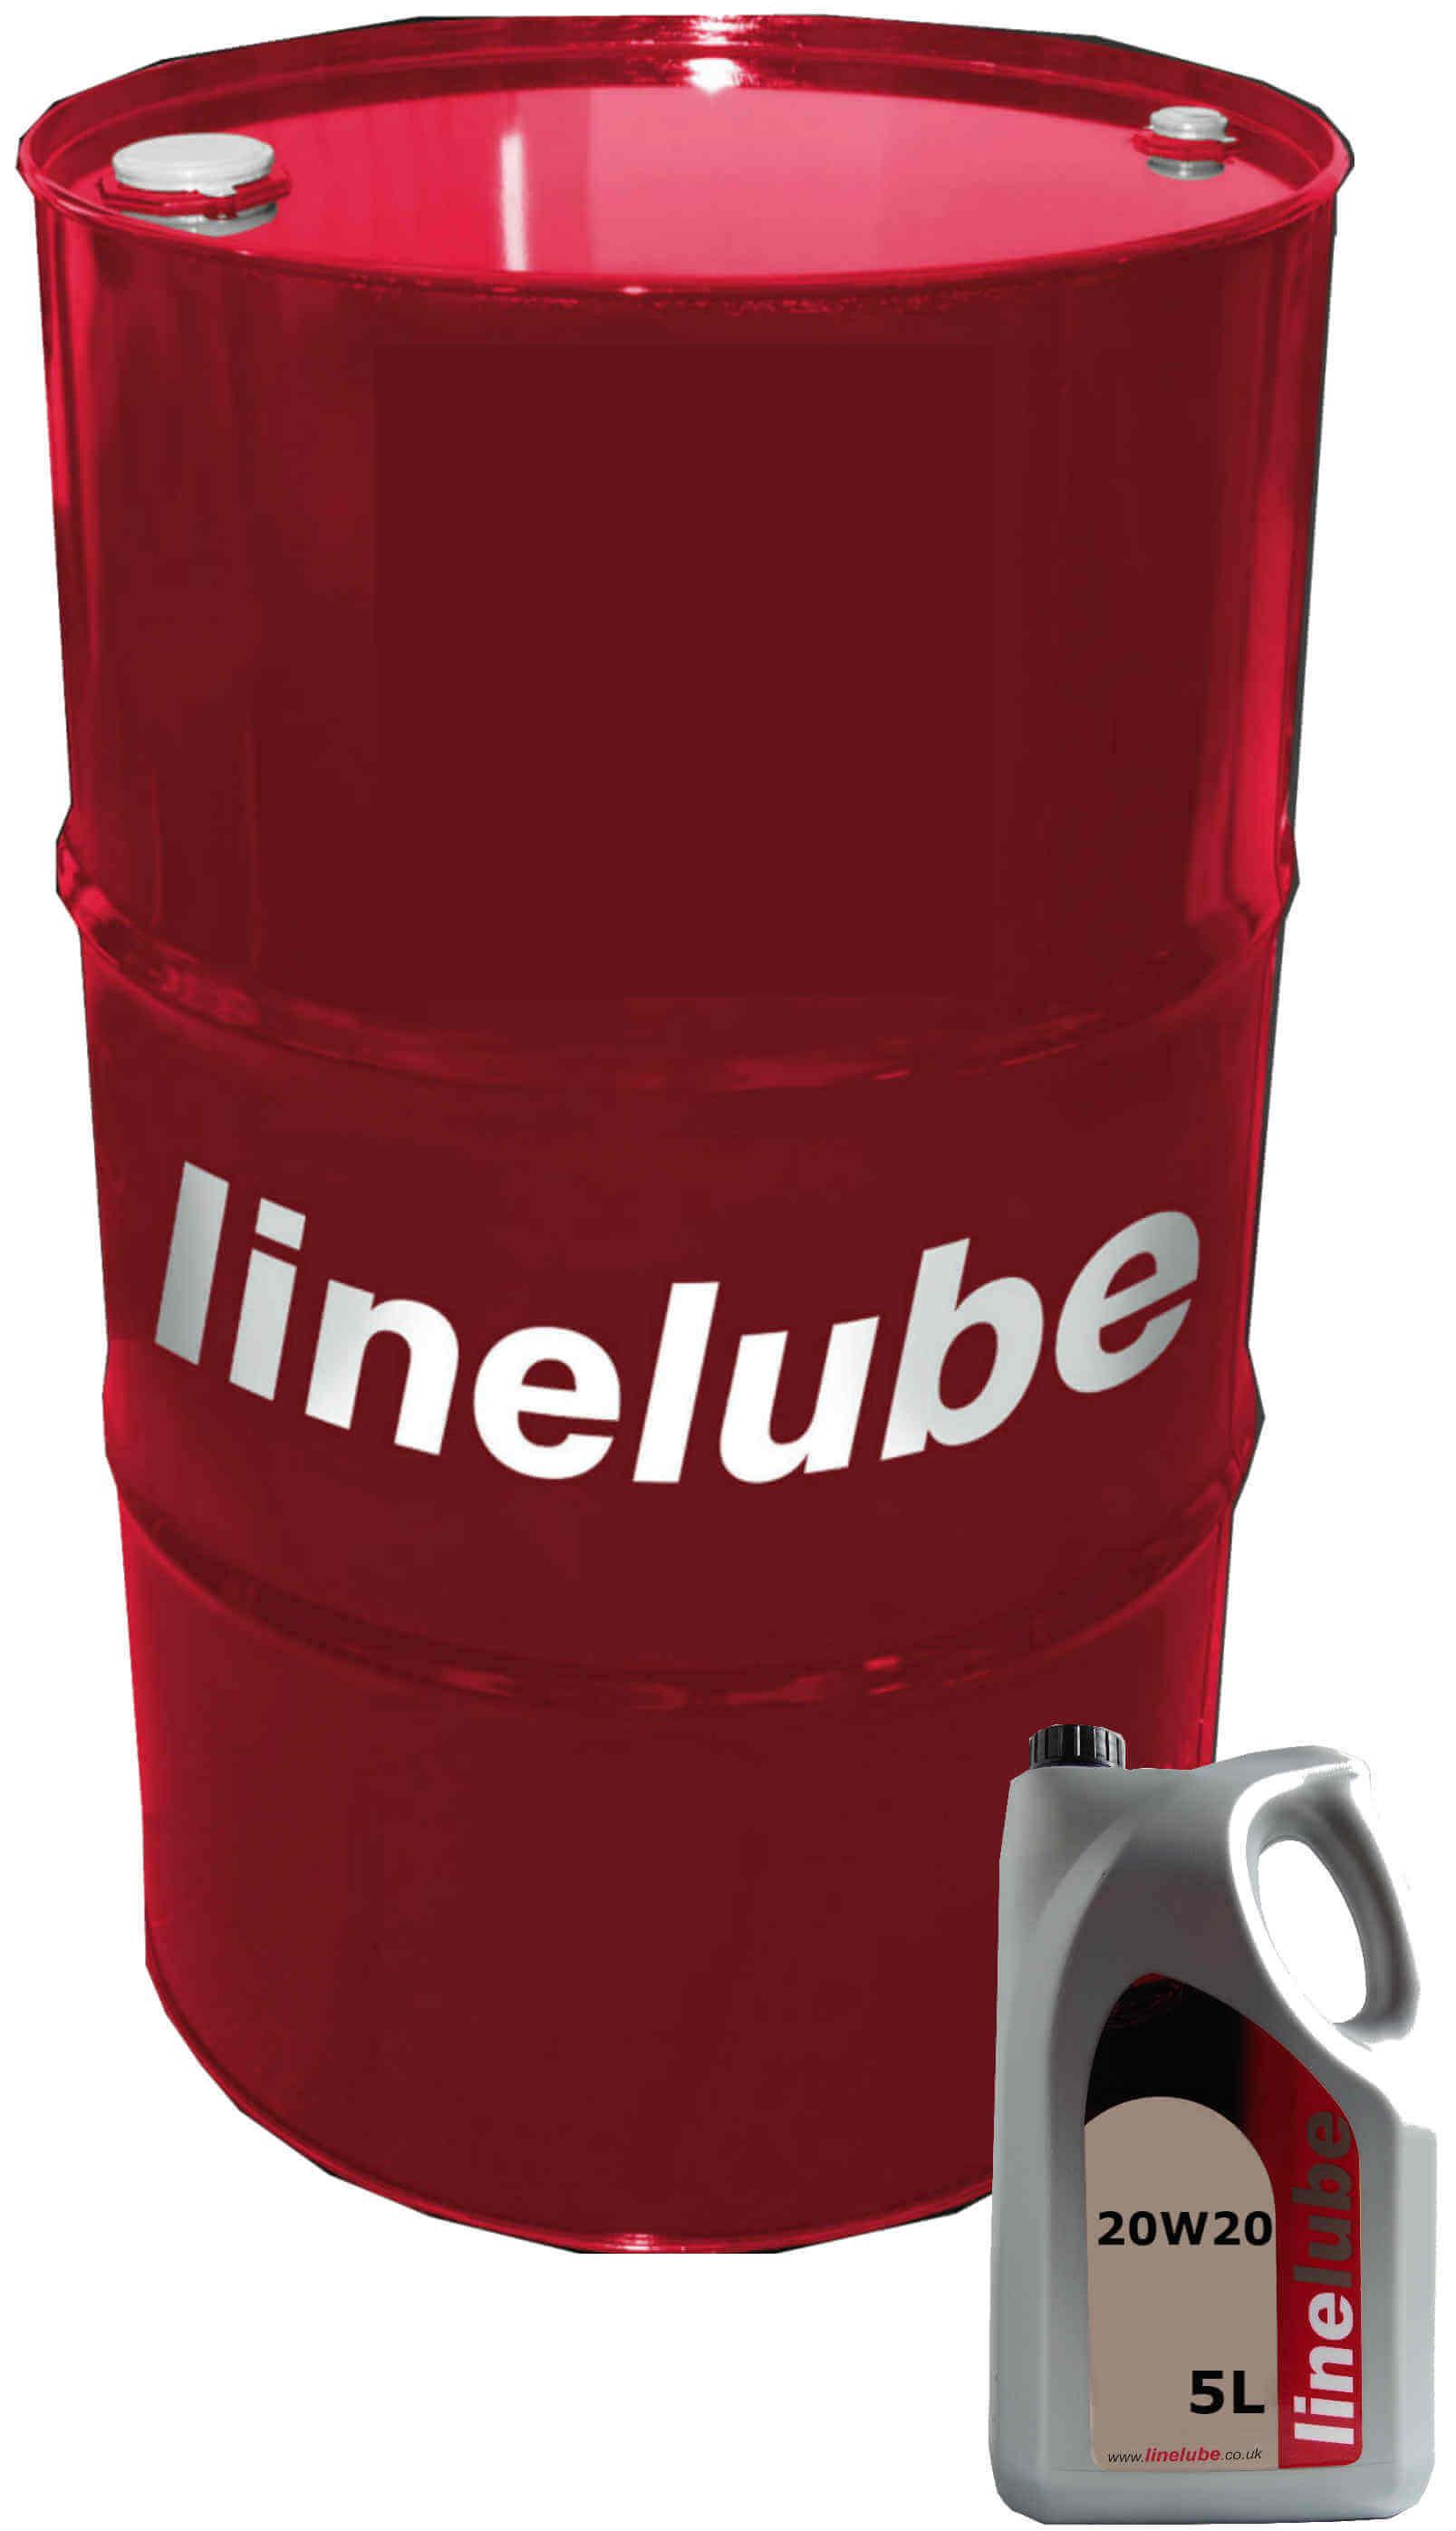 Linelube 20W20